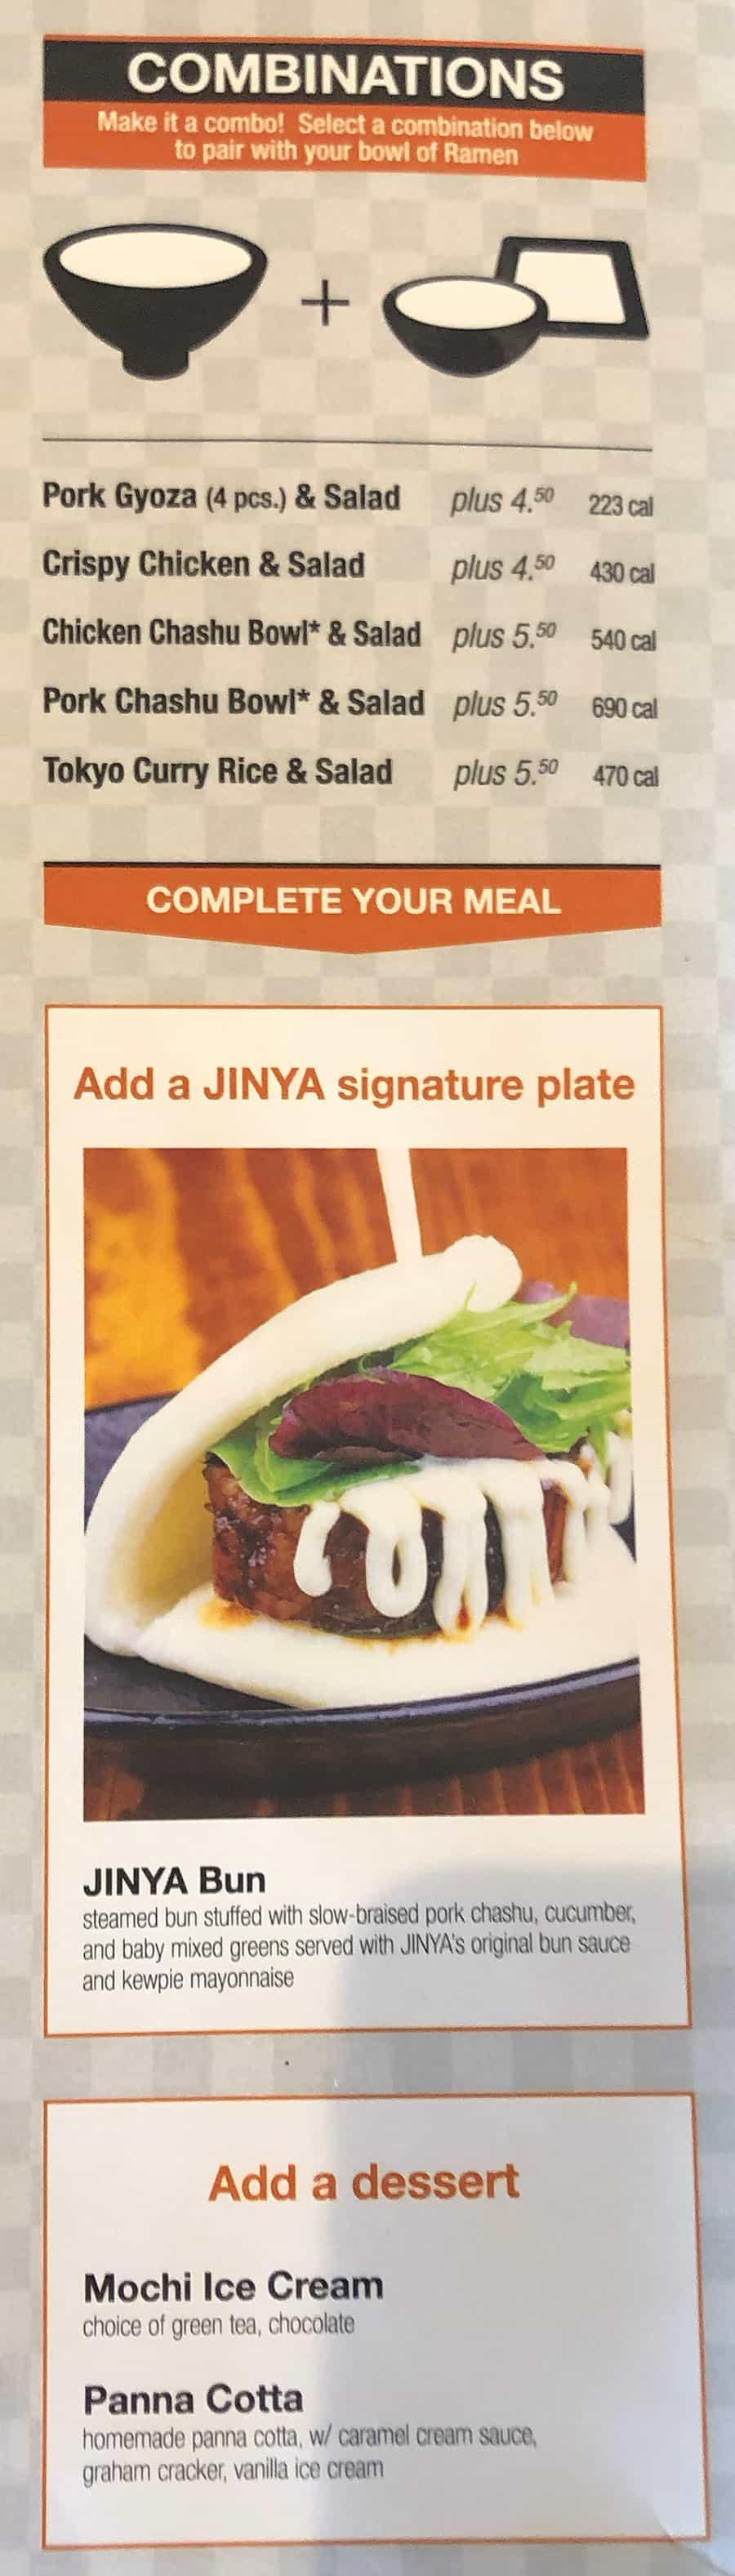 JINYA Ramen Bar menu - combinations